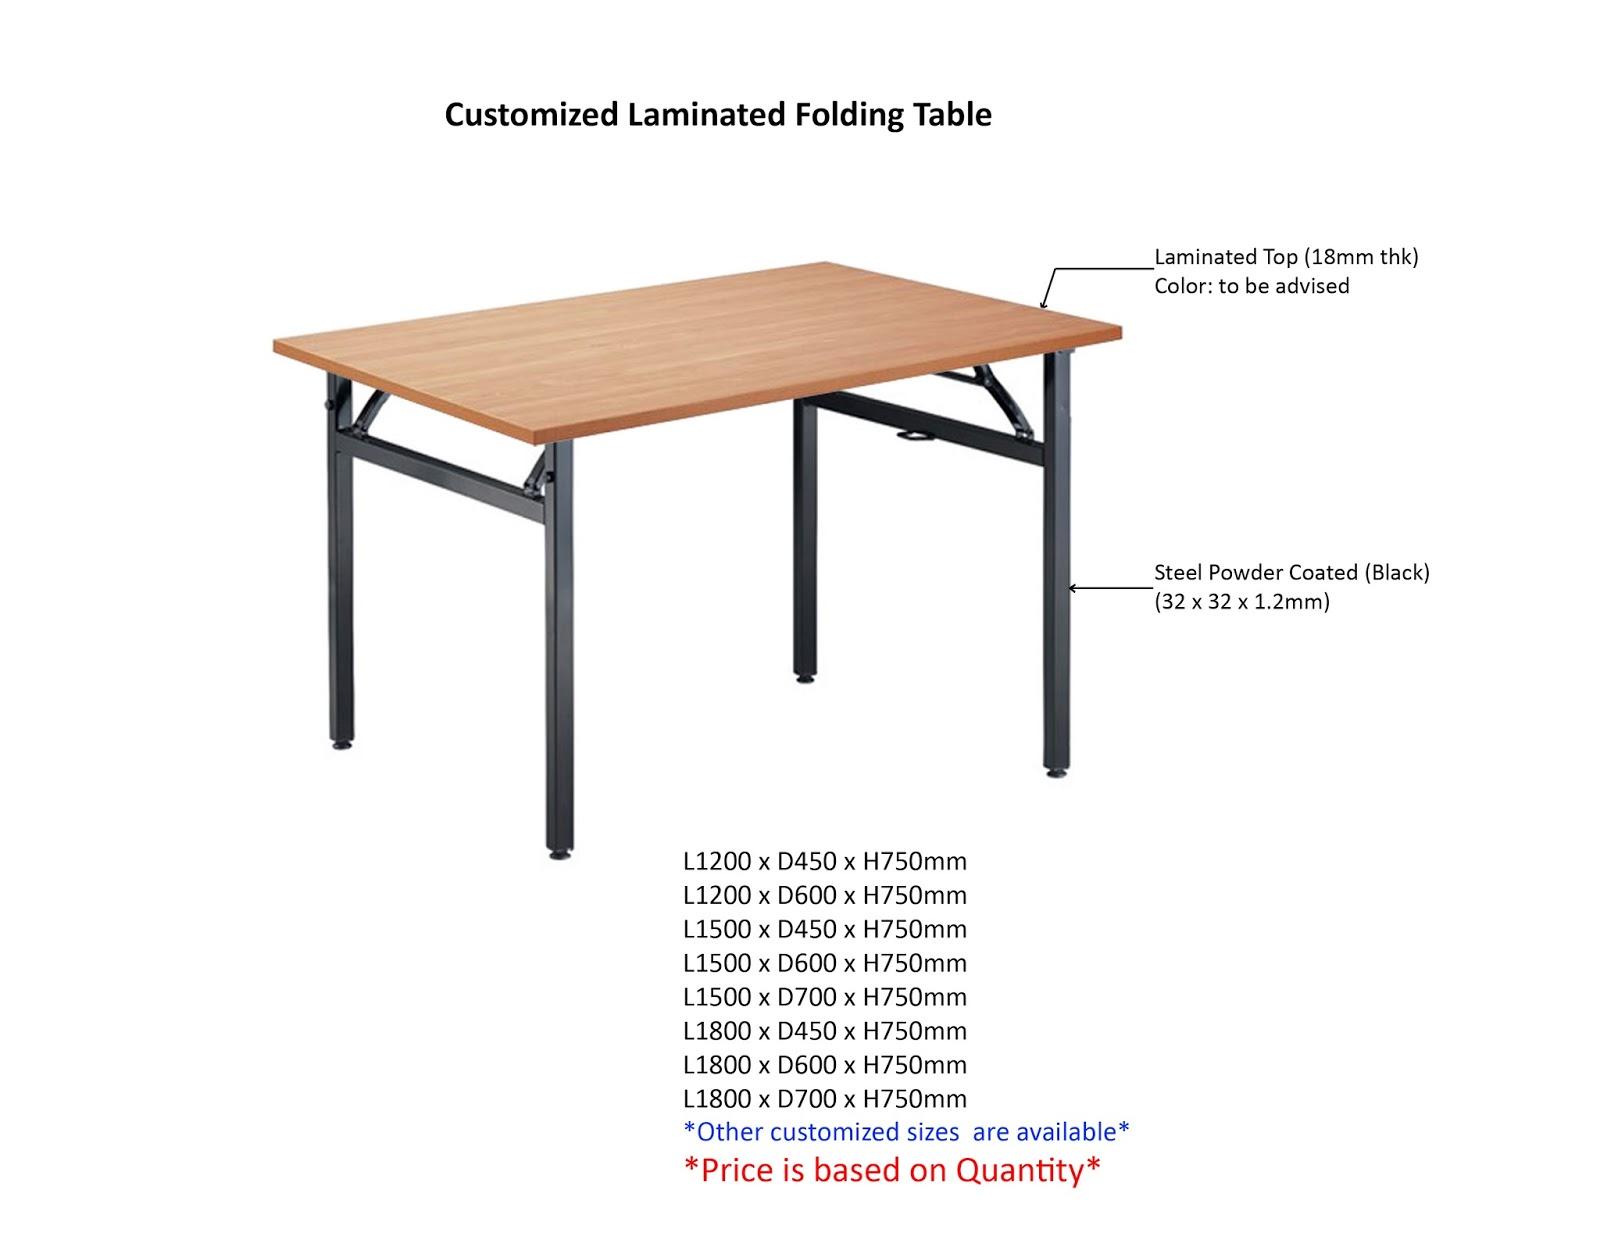 Customized Laminated Folding Table (MOQ: 10pcs)